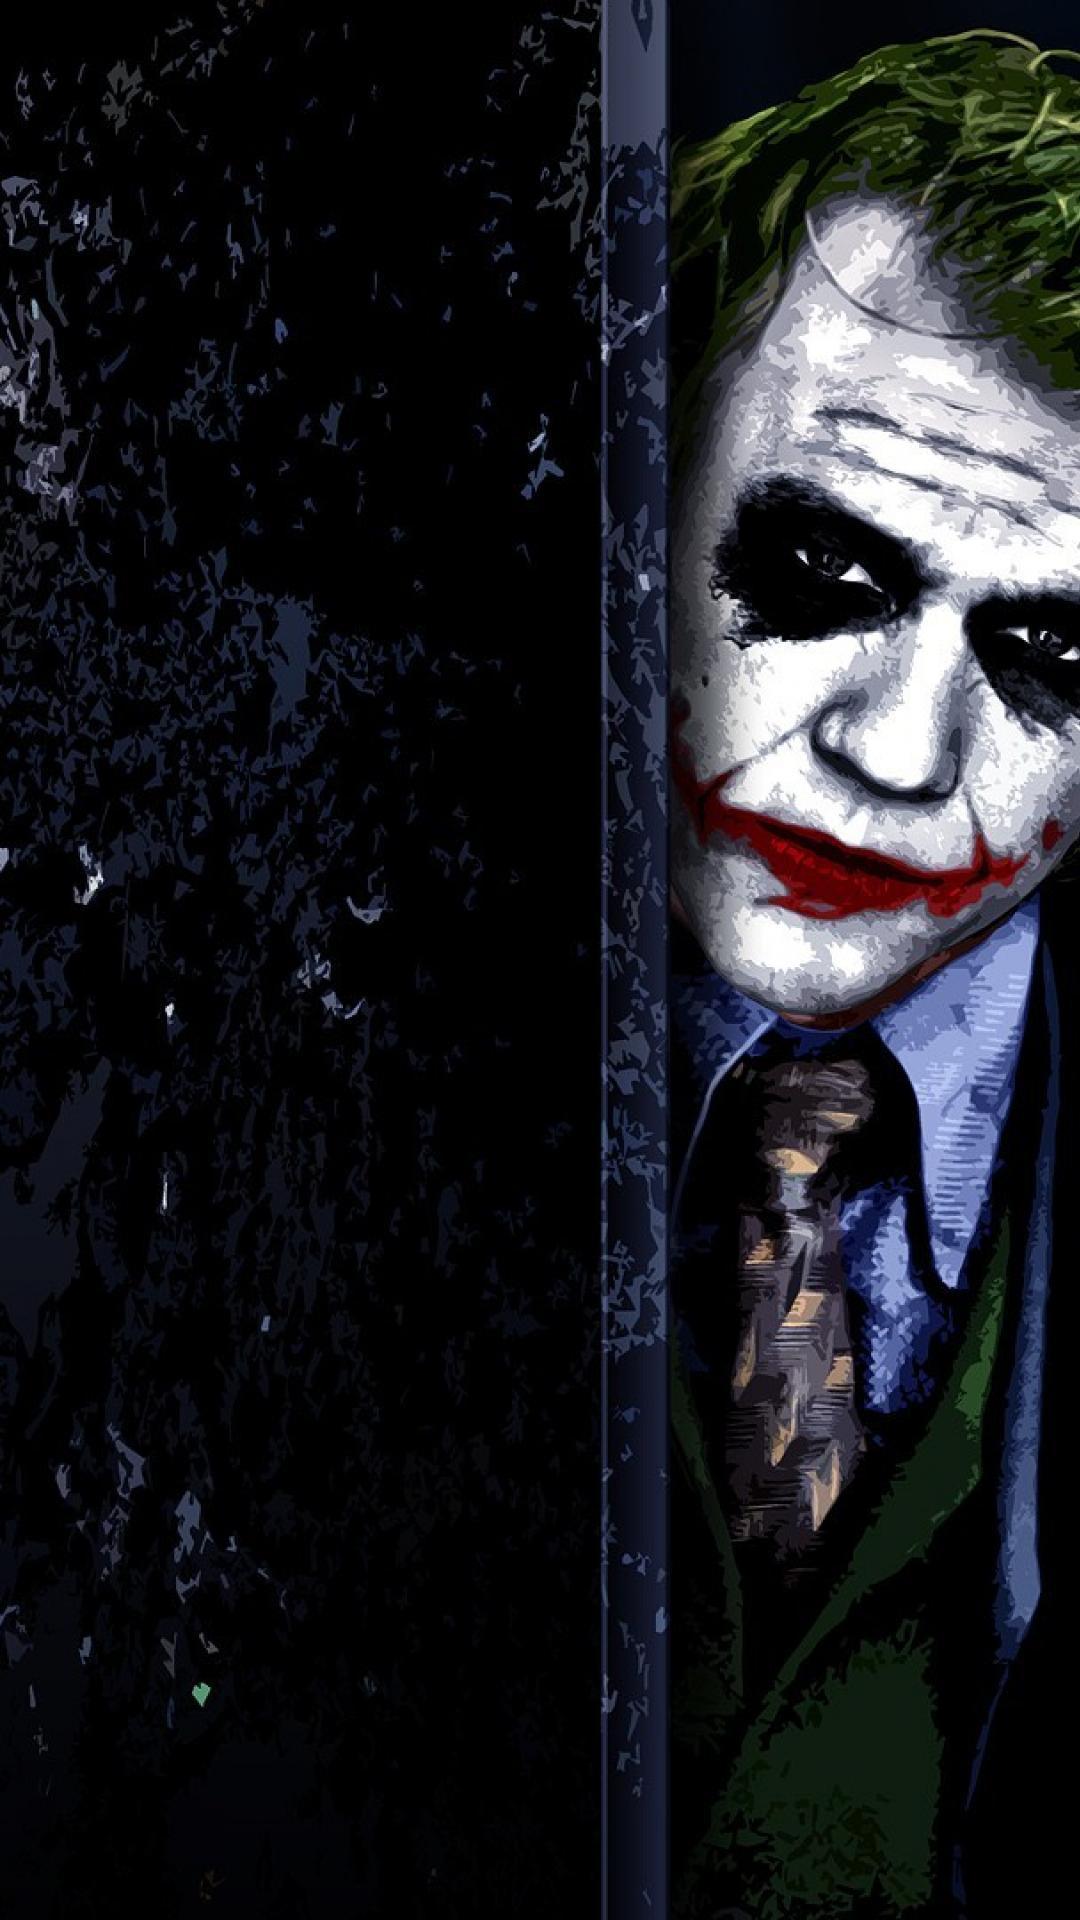 Joker Background Image HD HD Wallpapers 1080x1920